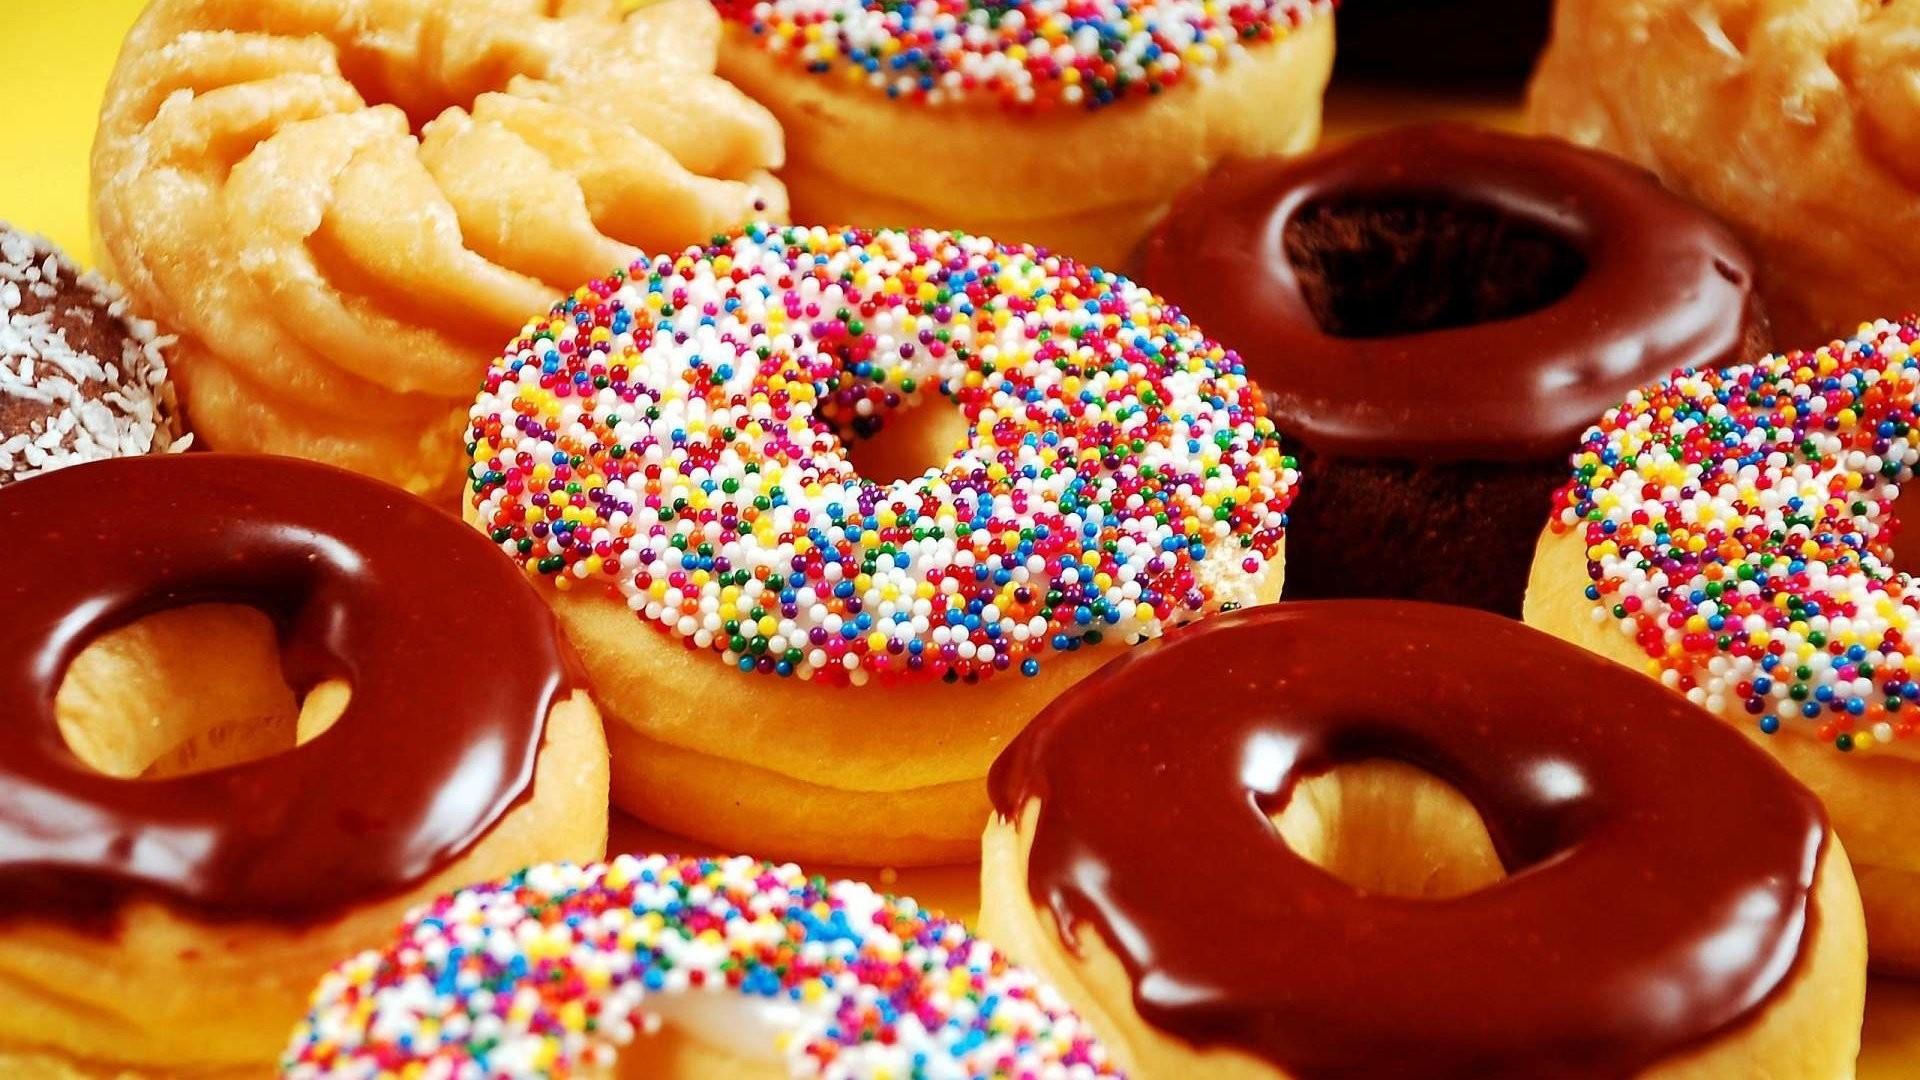 Donut Wallpaper image hd